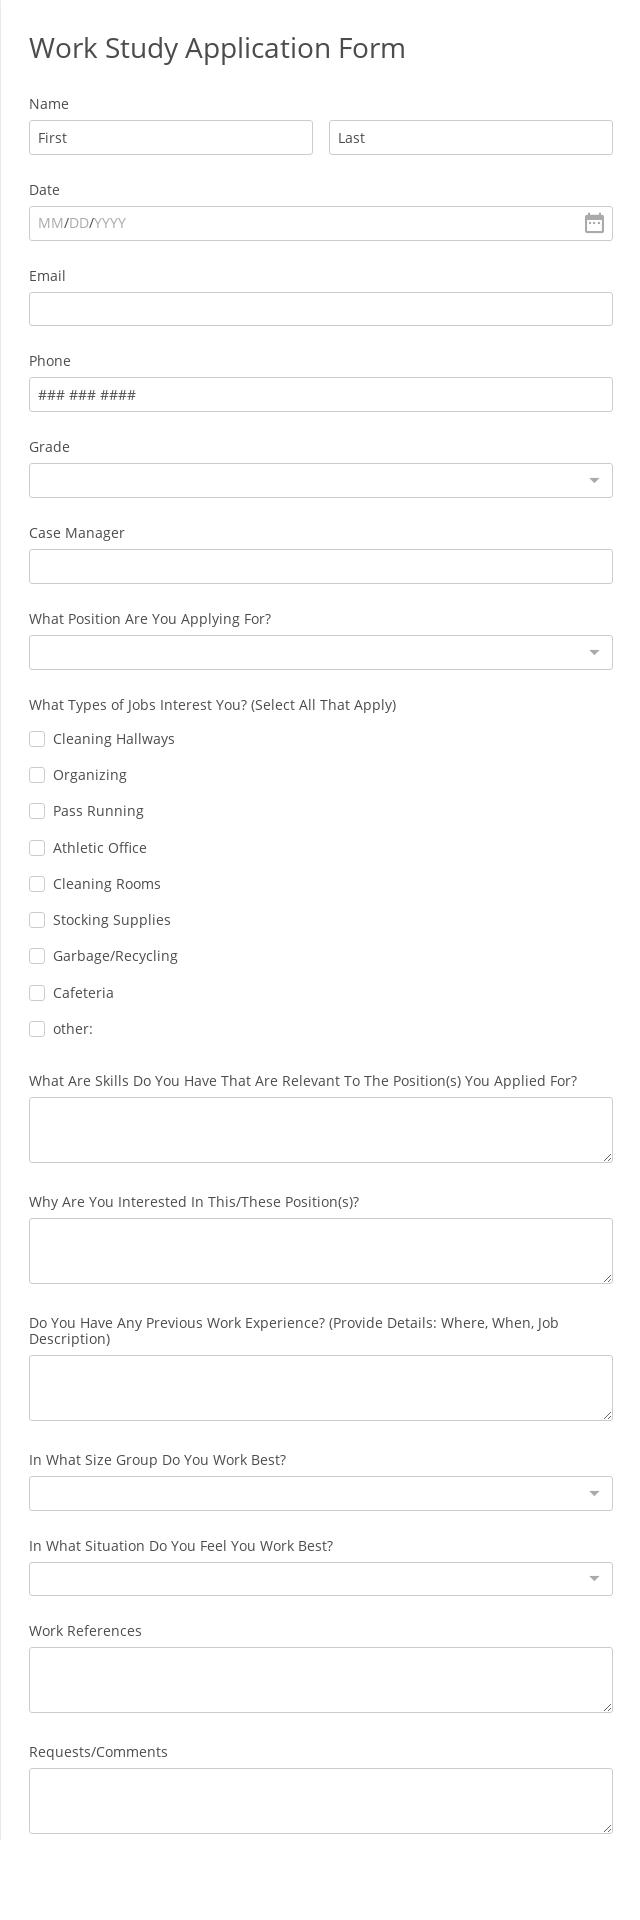 Work Study Application Form